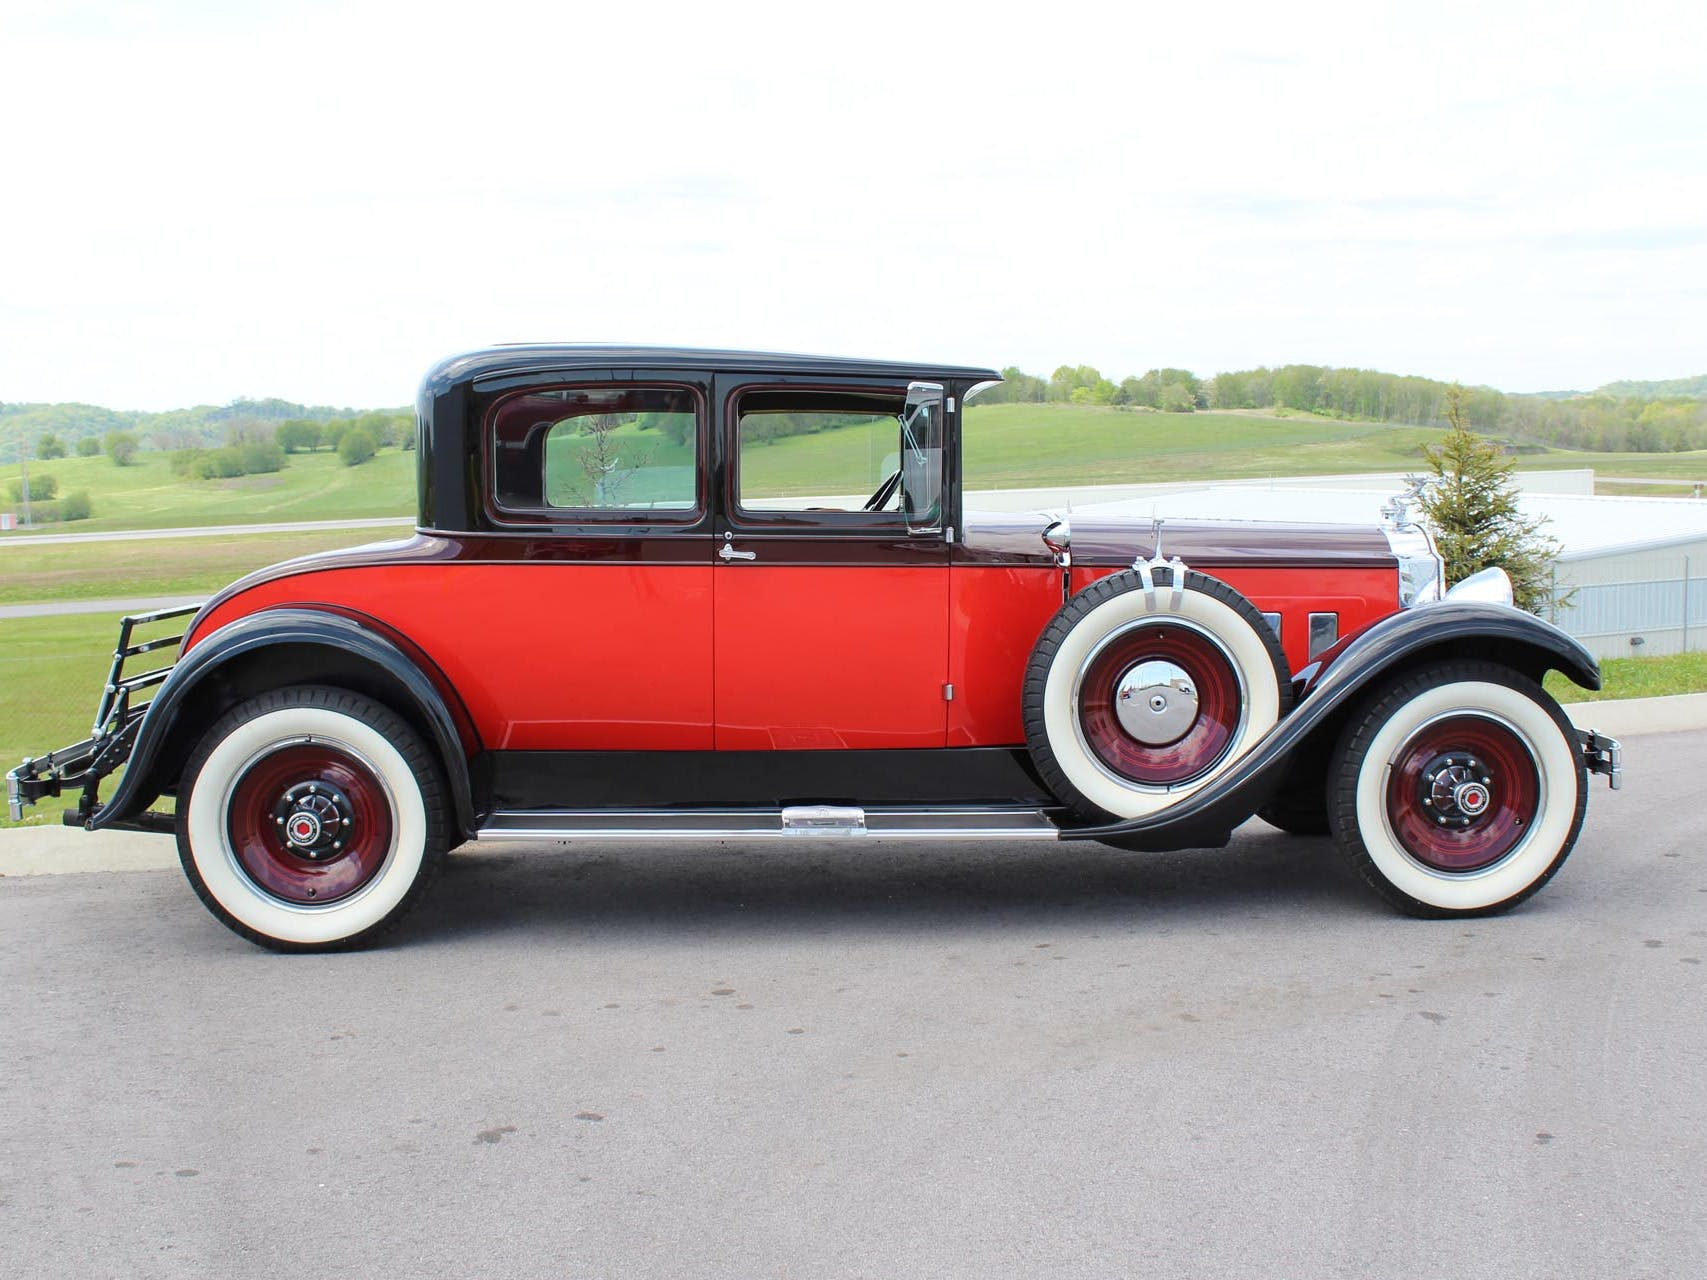 1929 Packard 640 Custom Eight 'Opera' Coupe